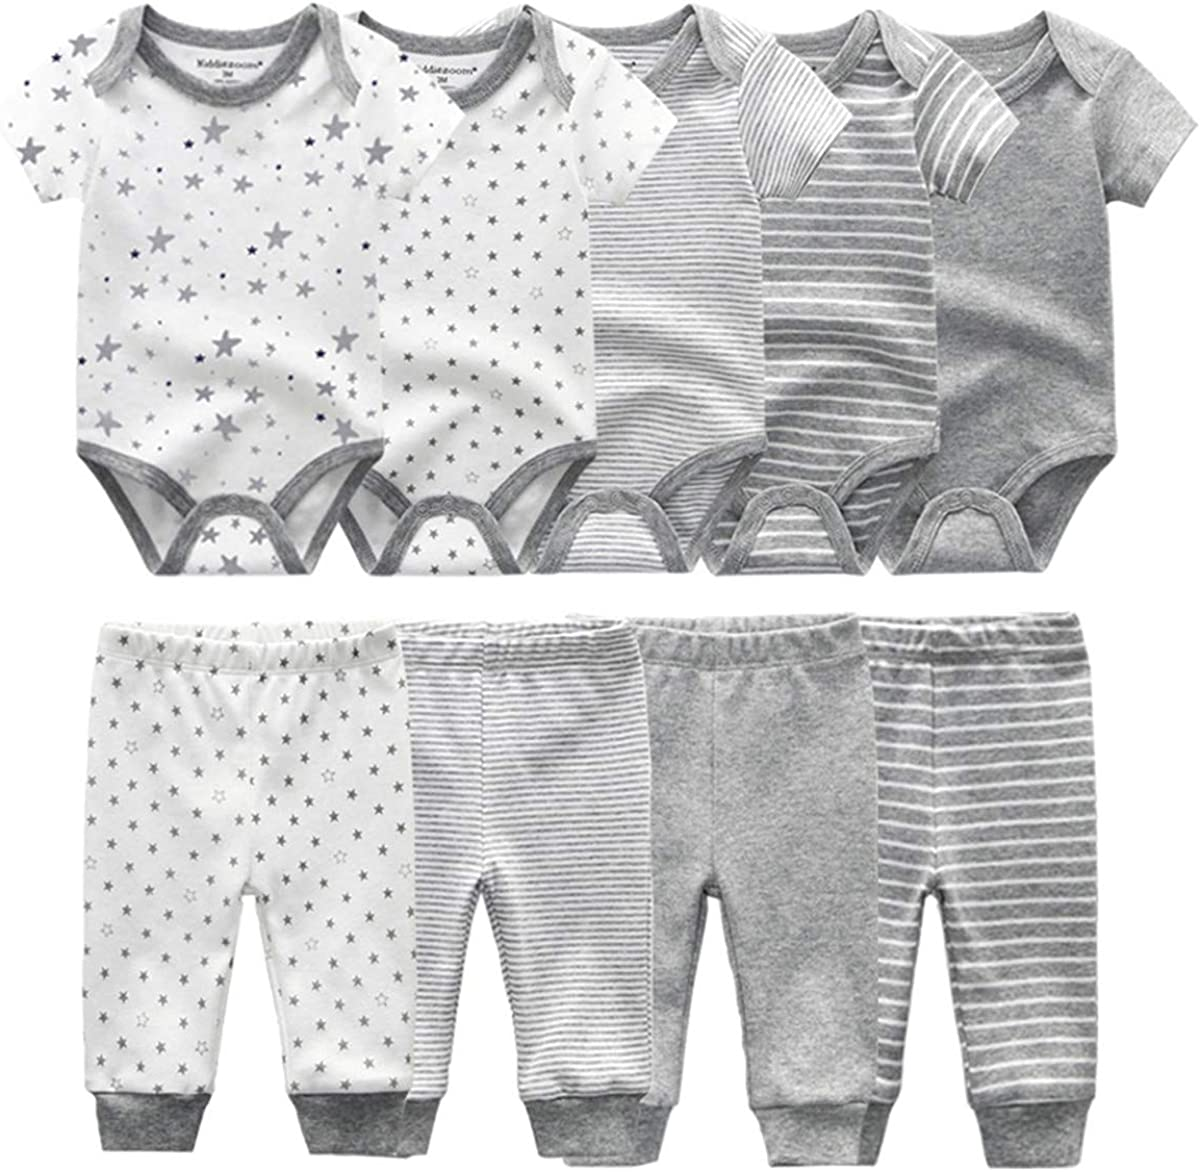 Kiddiezoom Unisex Newborn Baby Los Angeles Mall Layett Bodysuit National products Short-Sleeve